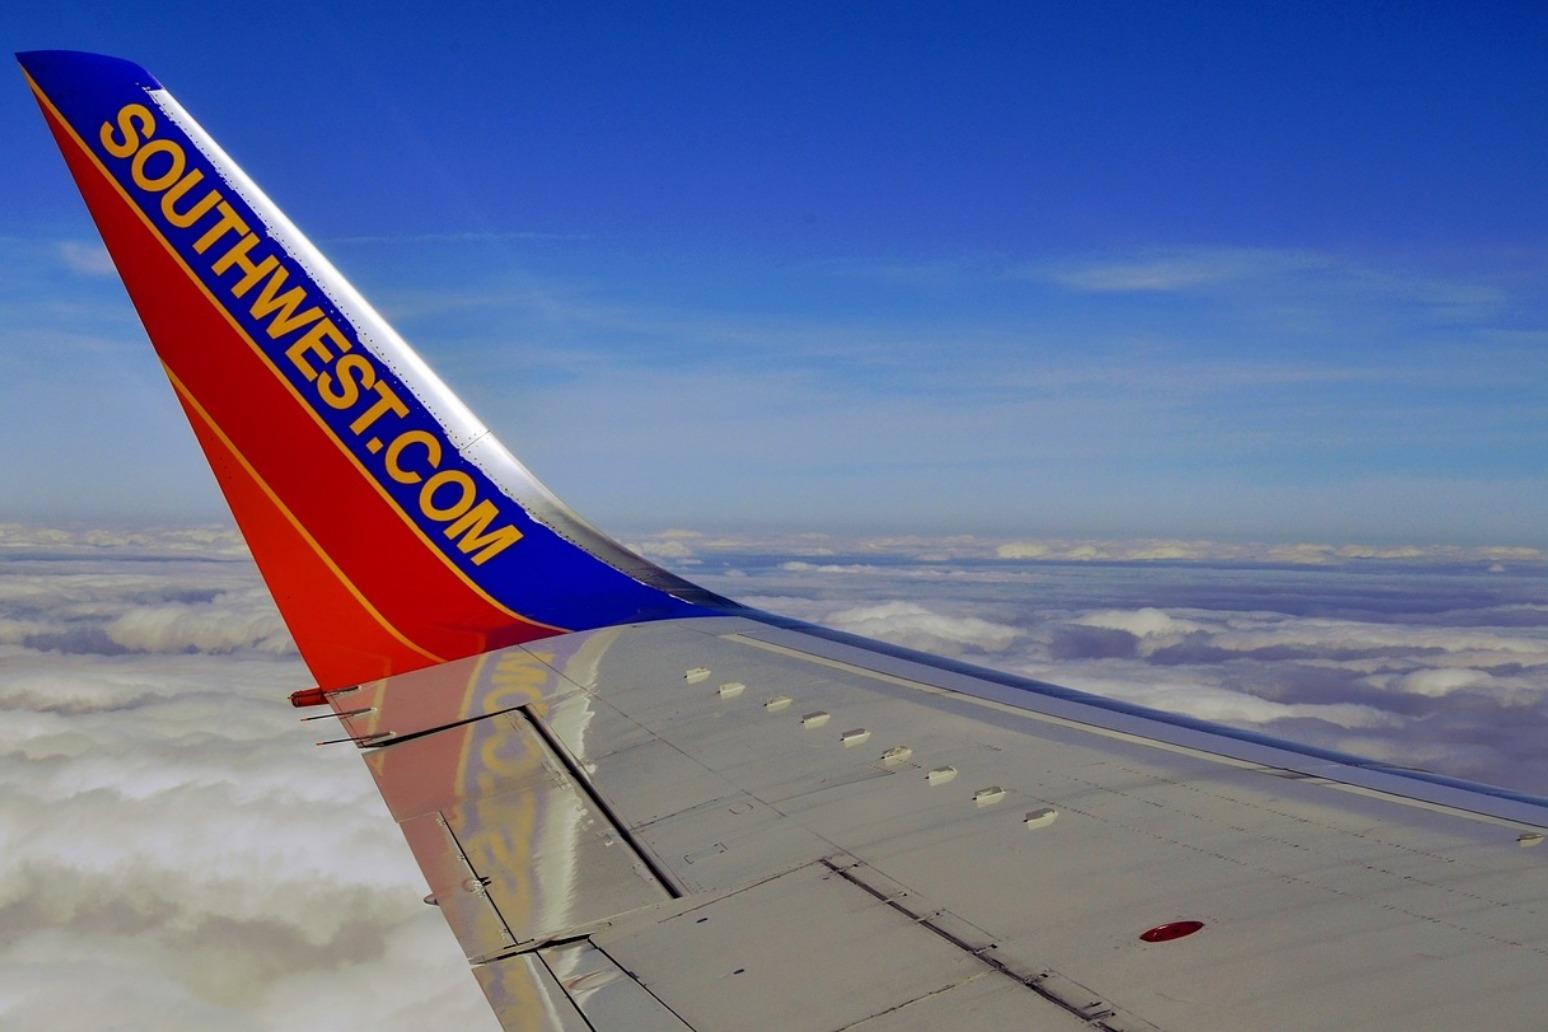 One dead after engine blast on passenger plane